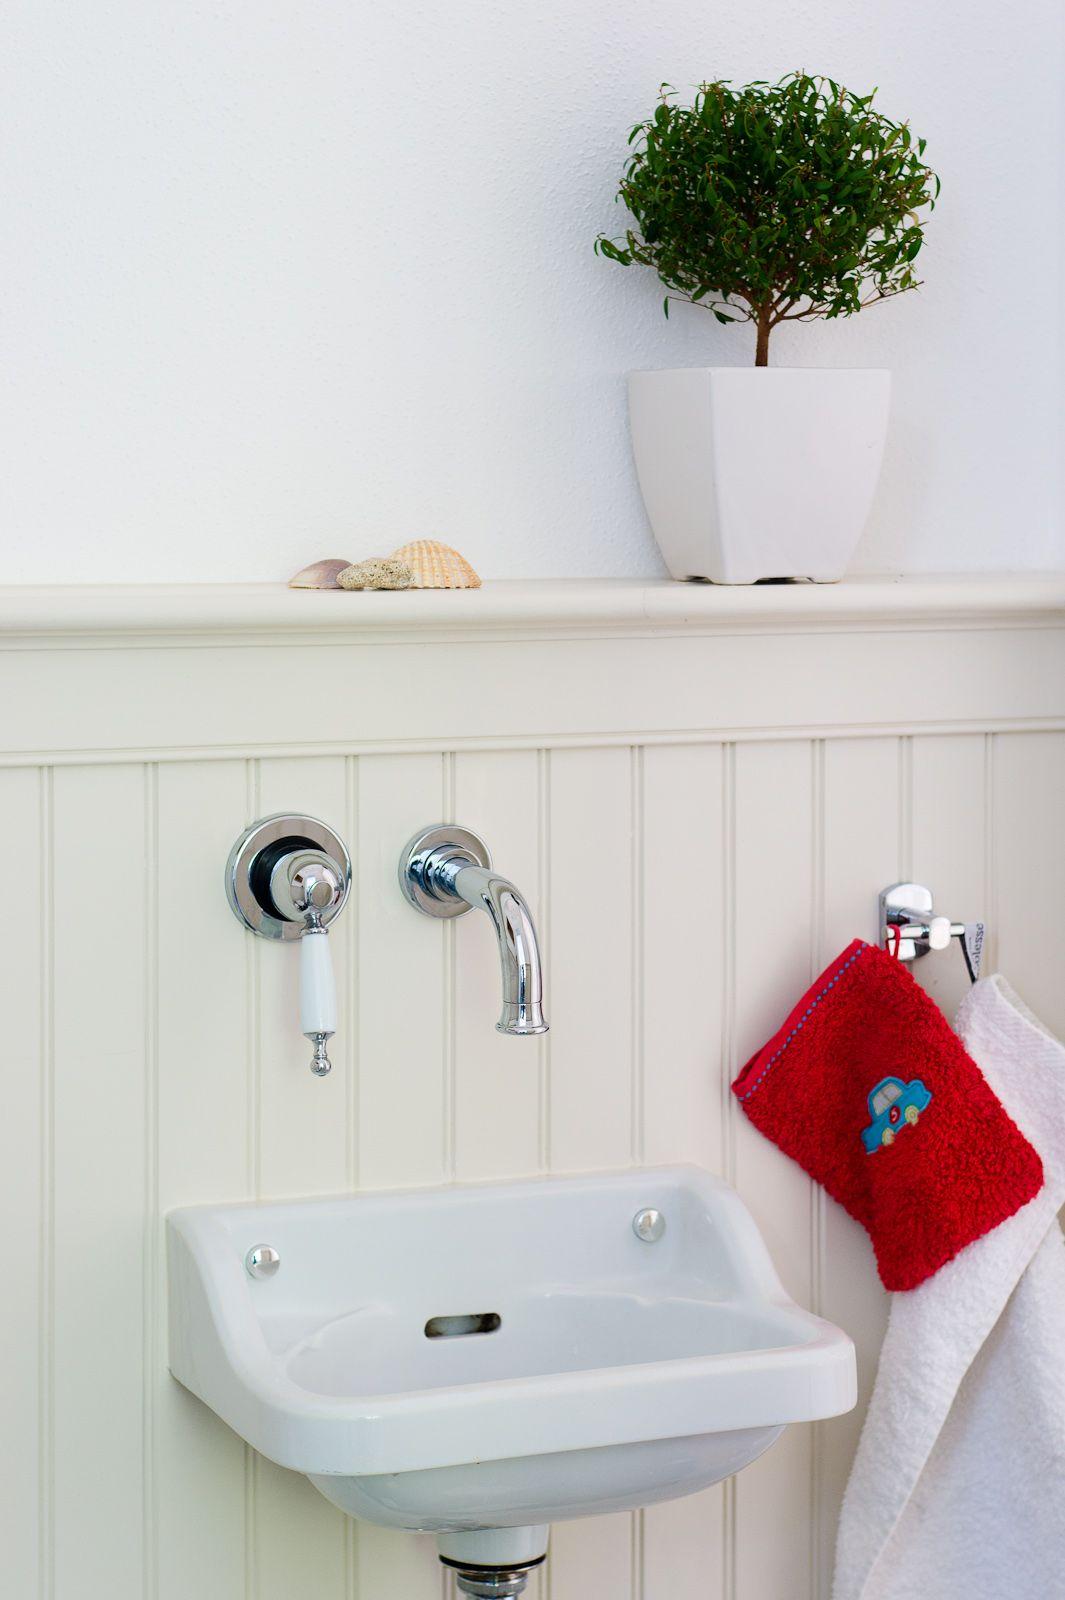 #beadboard.de Holzwandverkleidung Auch Im Badezimmer   Statt Fliesen